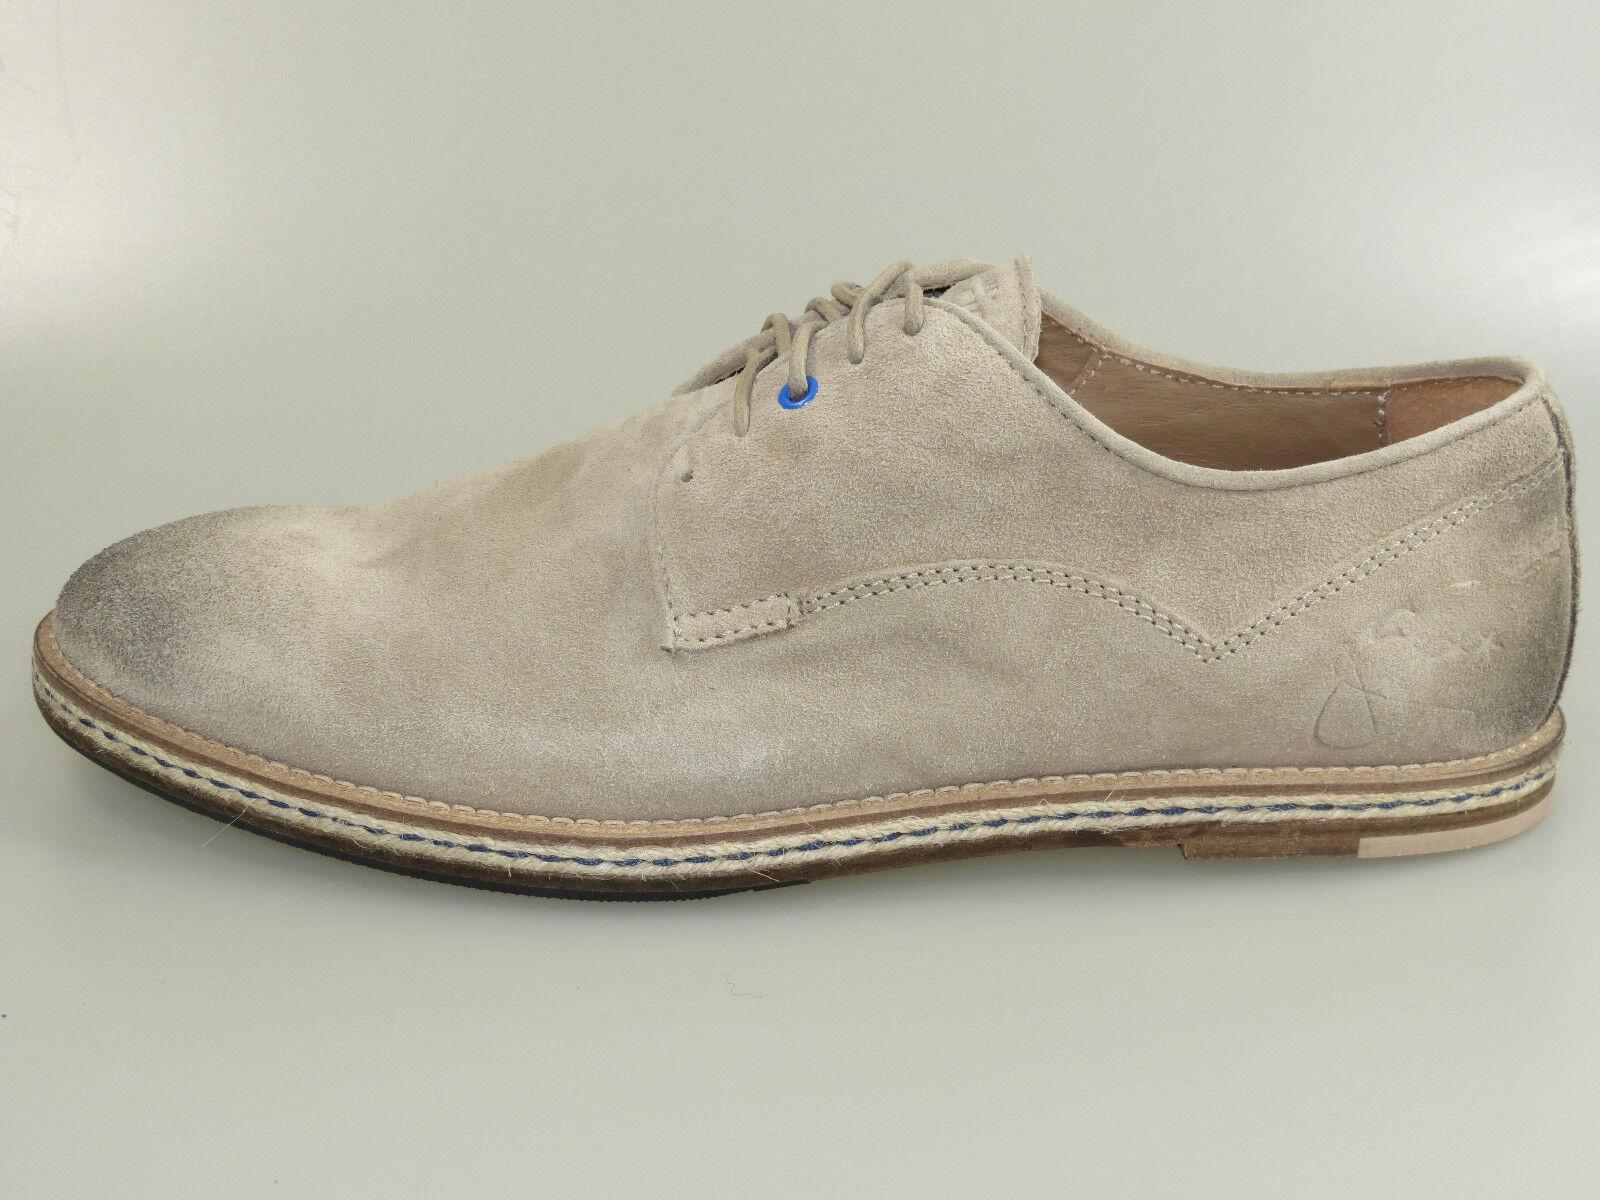 ENERGIE Zapatos assk f00517 su9641 csp851 a00200 Beige Cuero + NUEVO +. Muchas